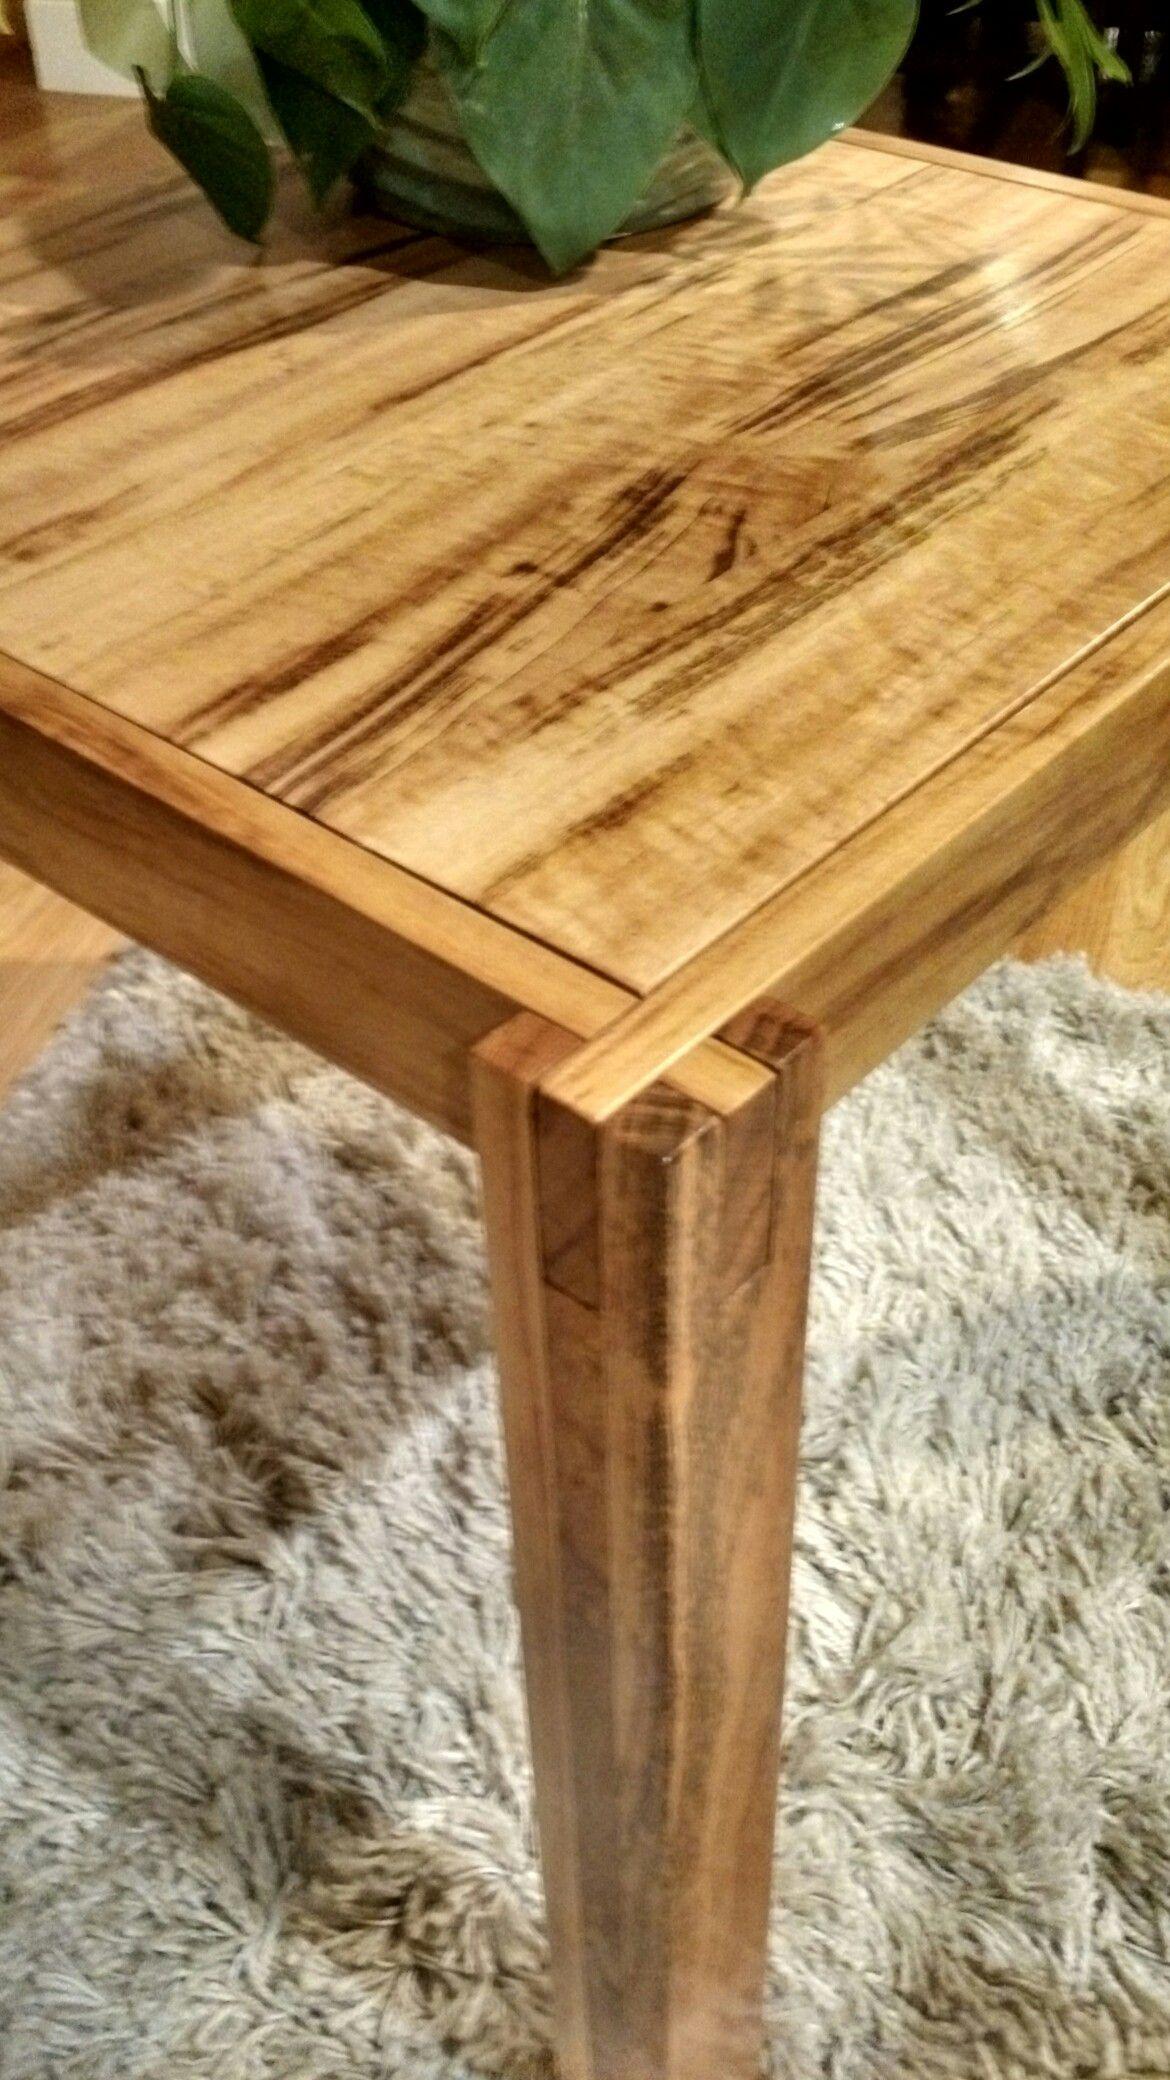 358fe1830fb7a0038295a1aabf88d6b6 Luxe De Fabriquer Table Basse Tactile Schème